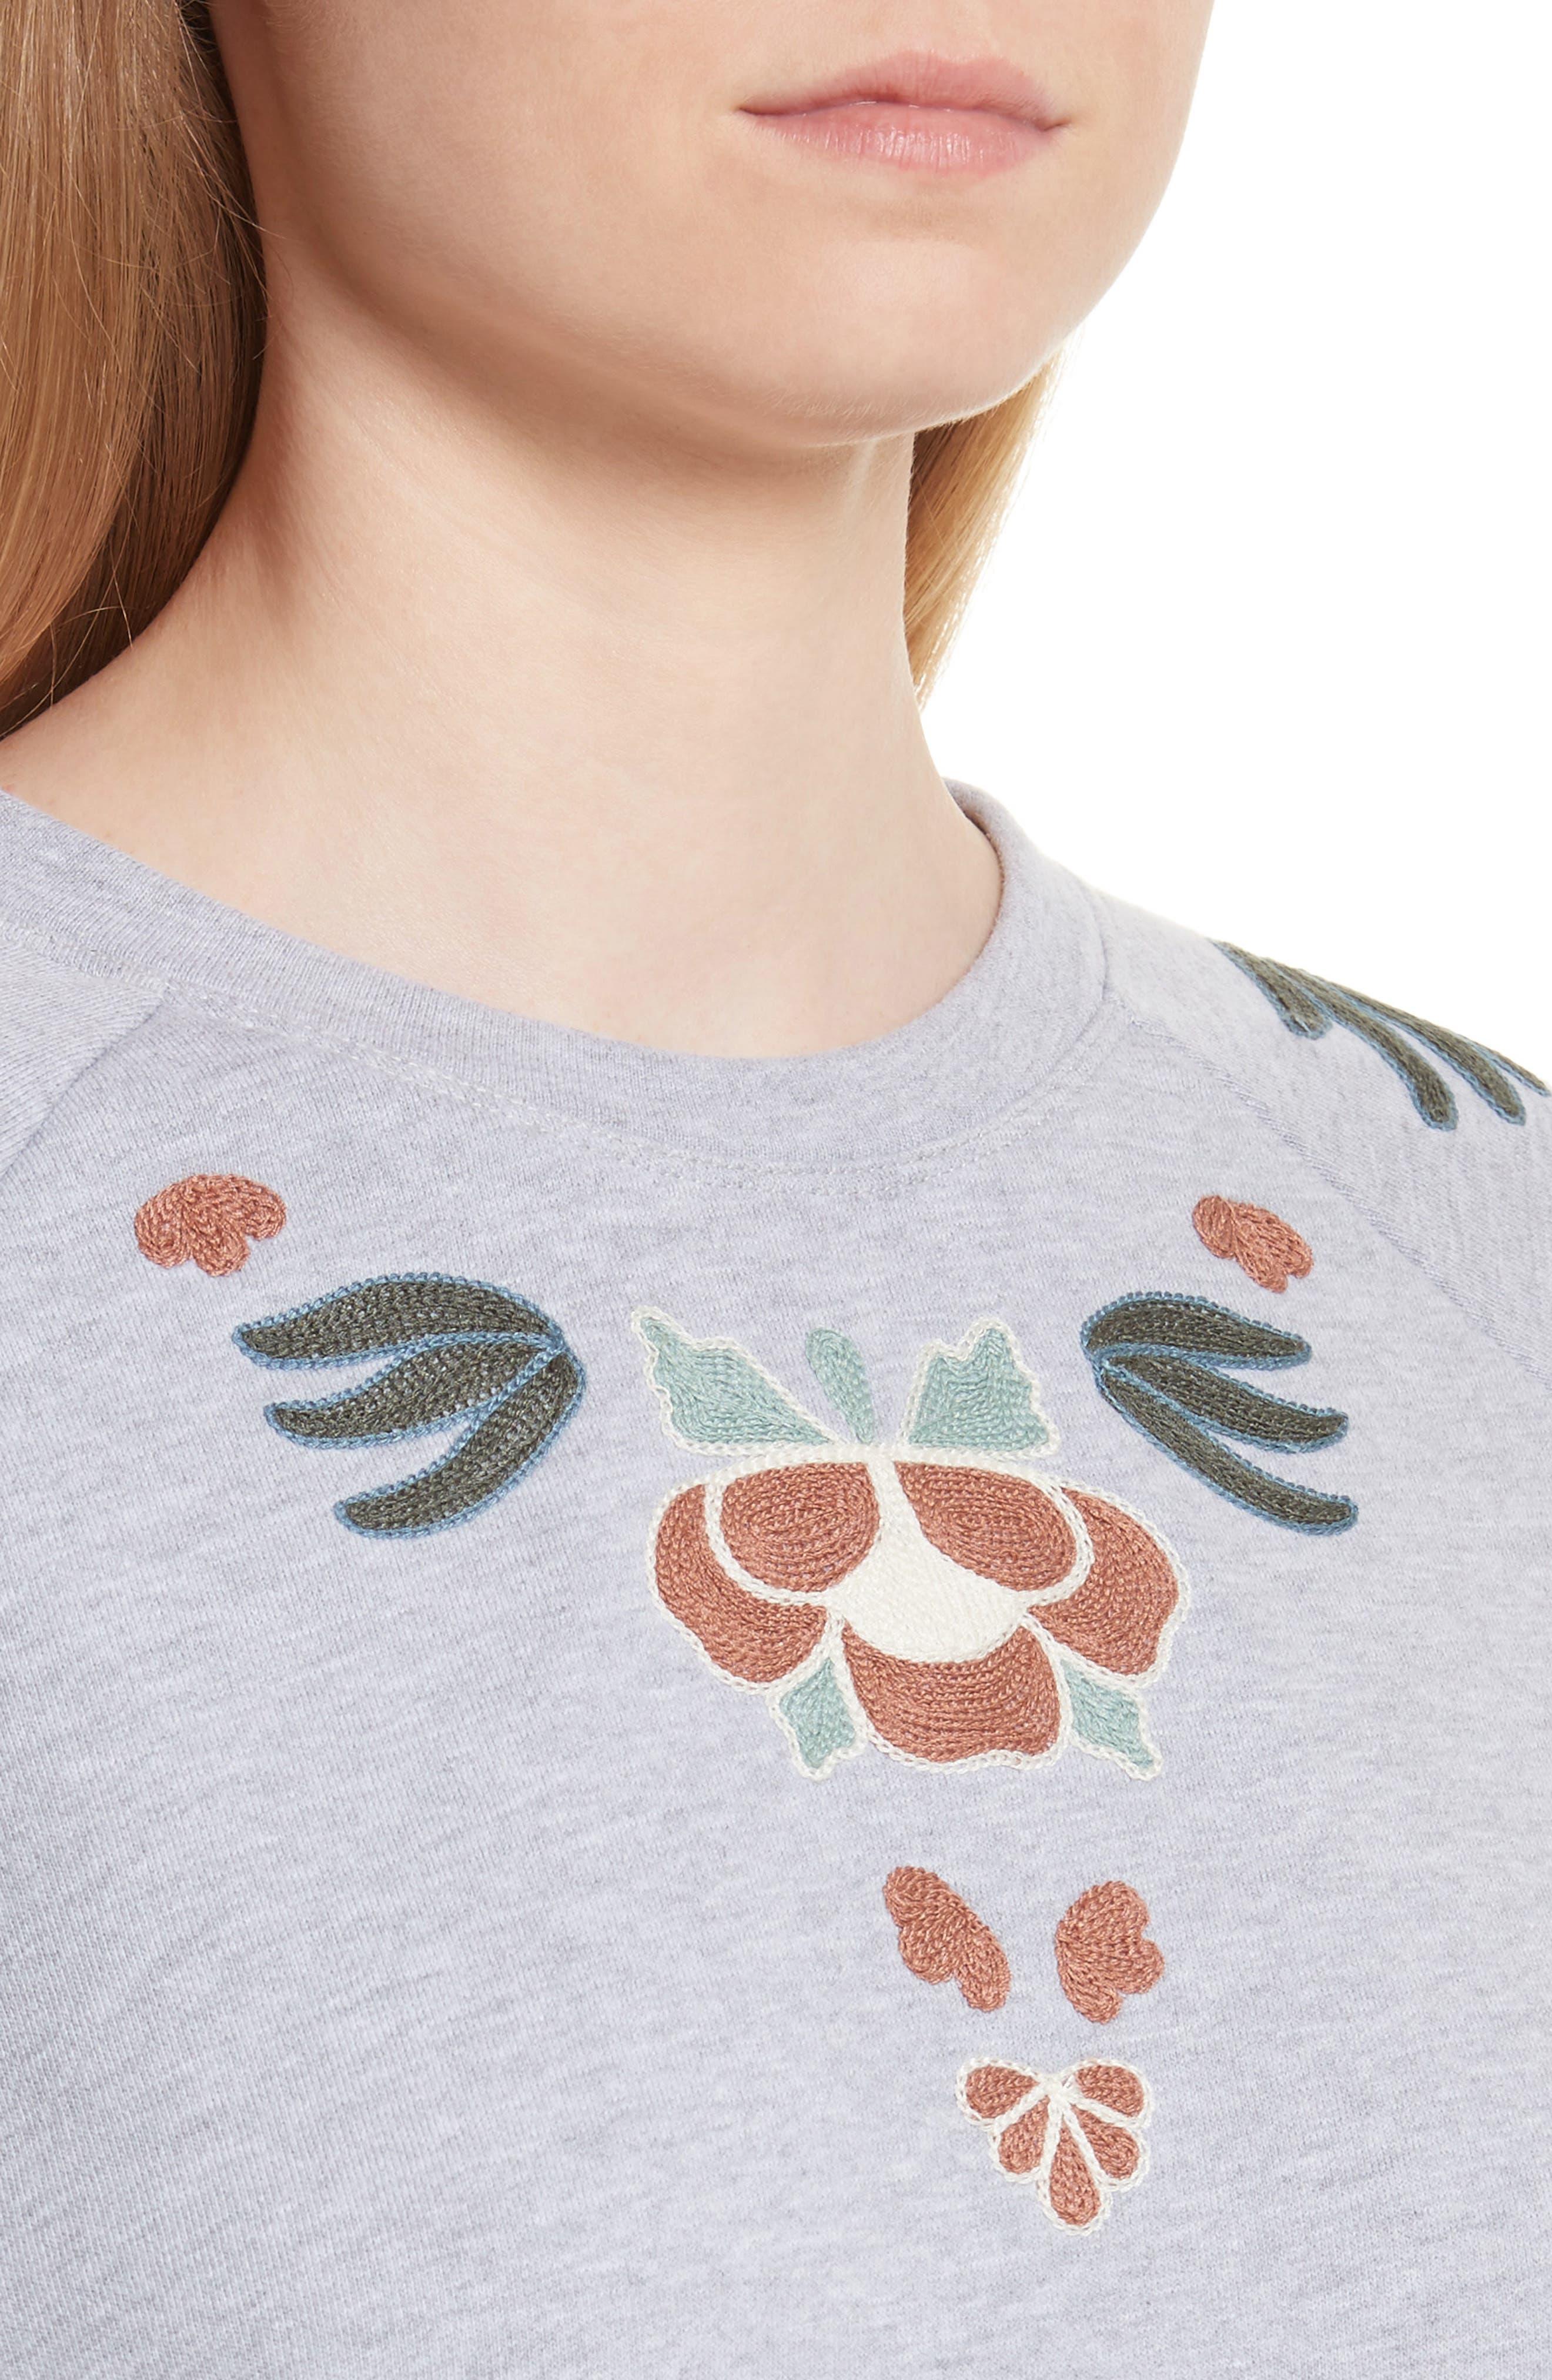 Jennings Embroidered Sweatshirt,                             Alternate thumbnail 4, color,                             021